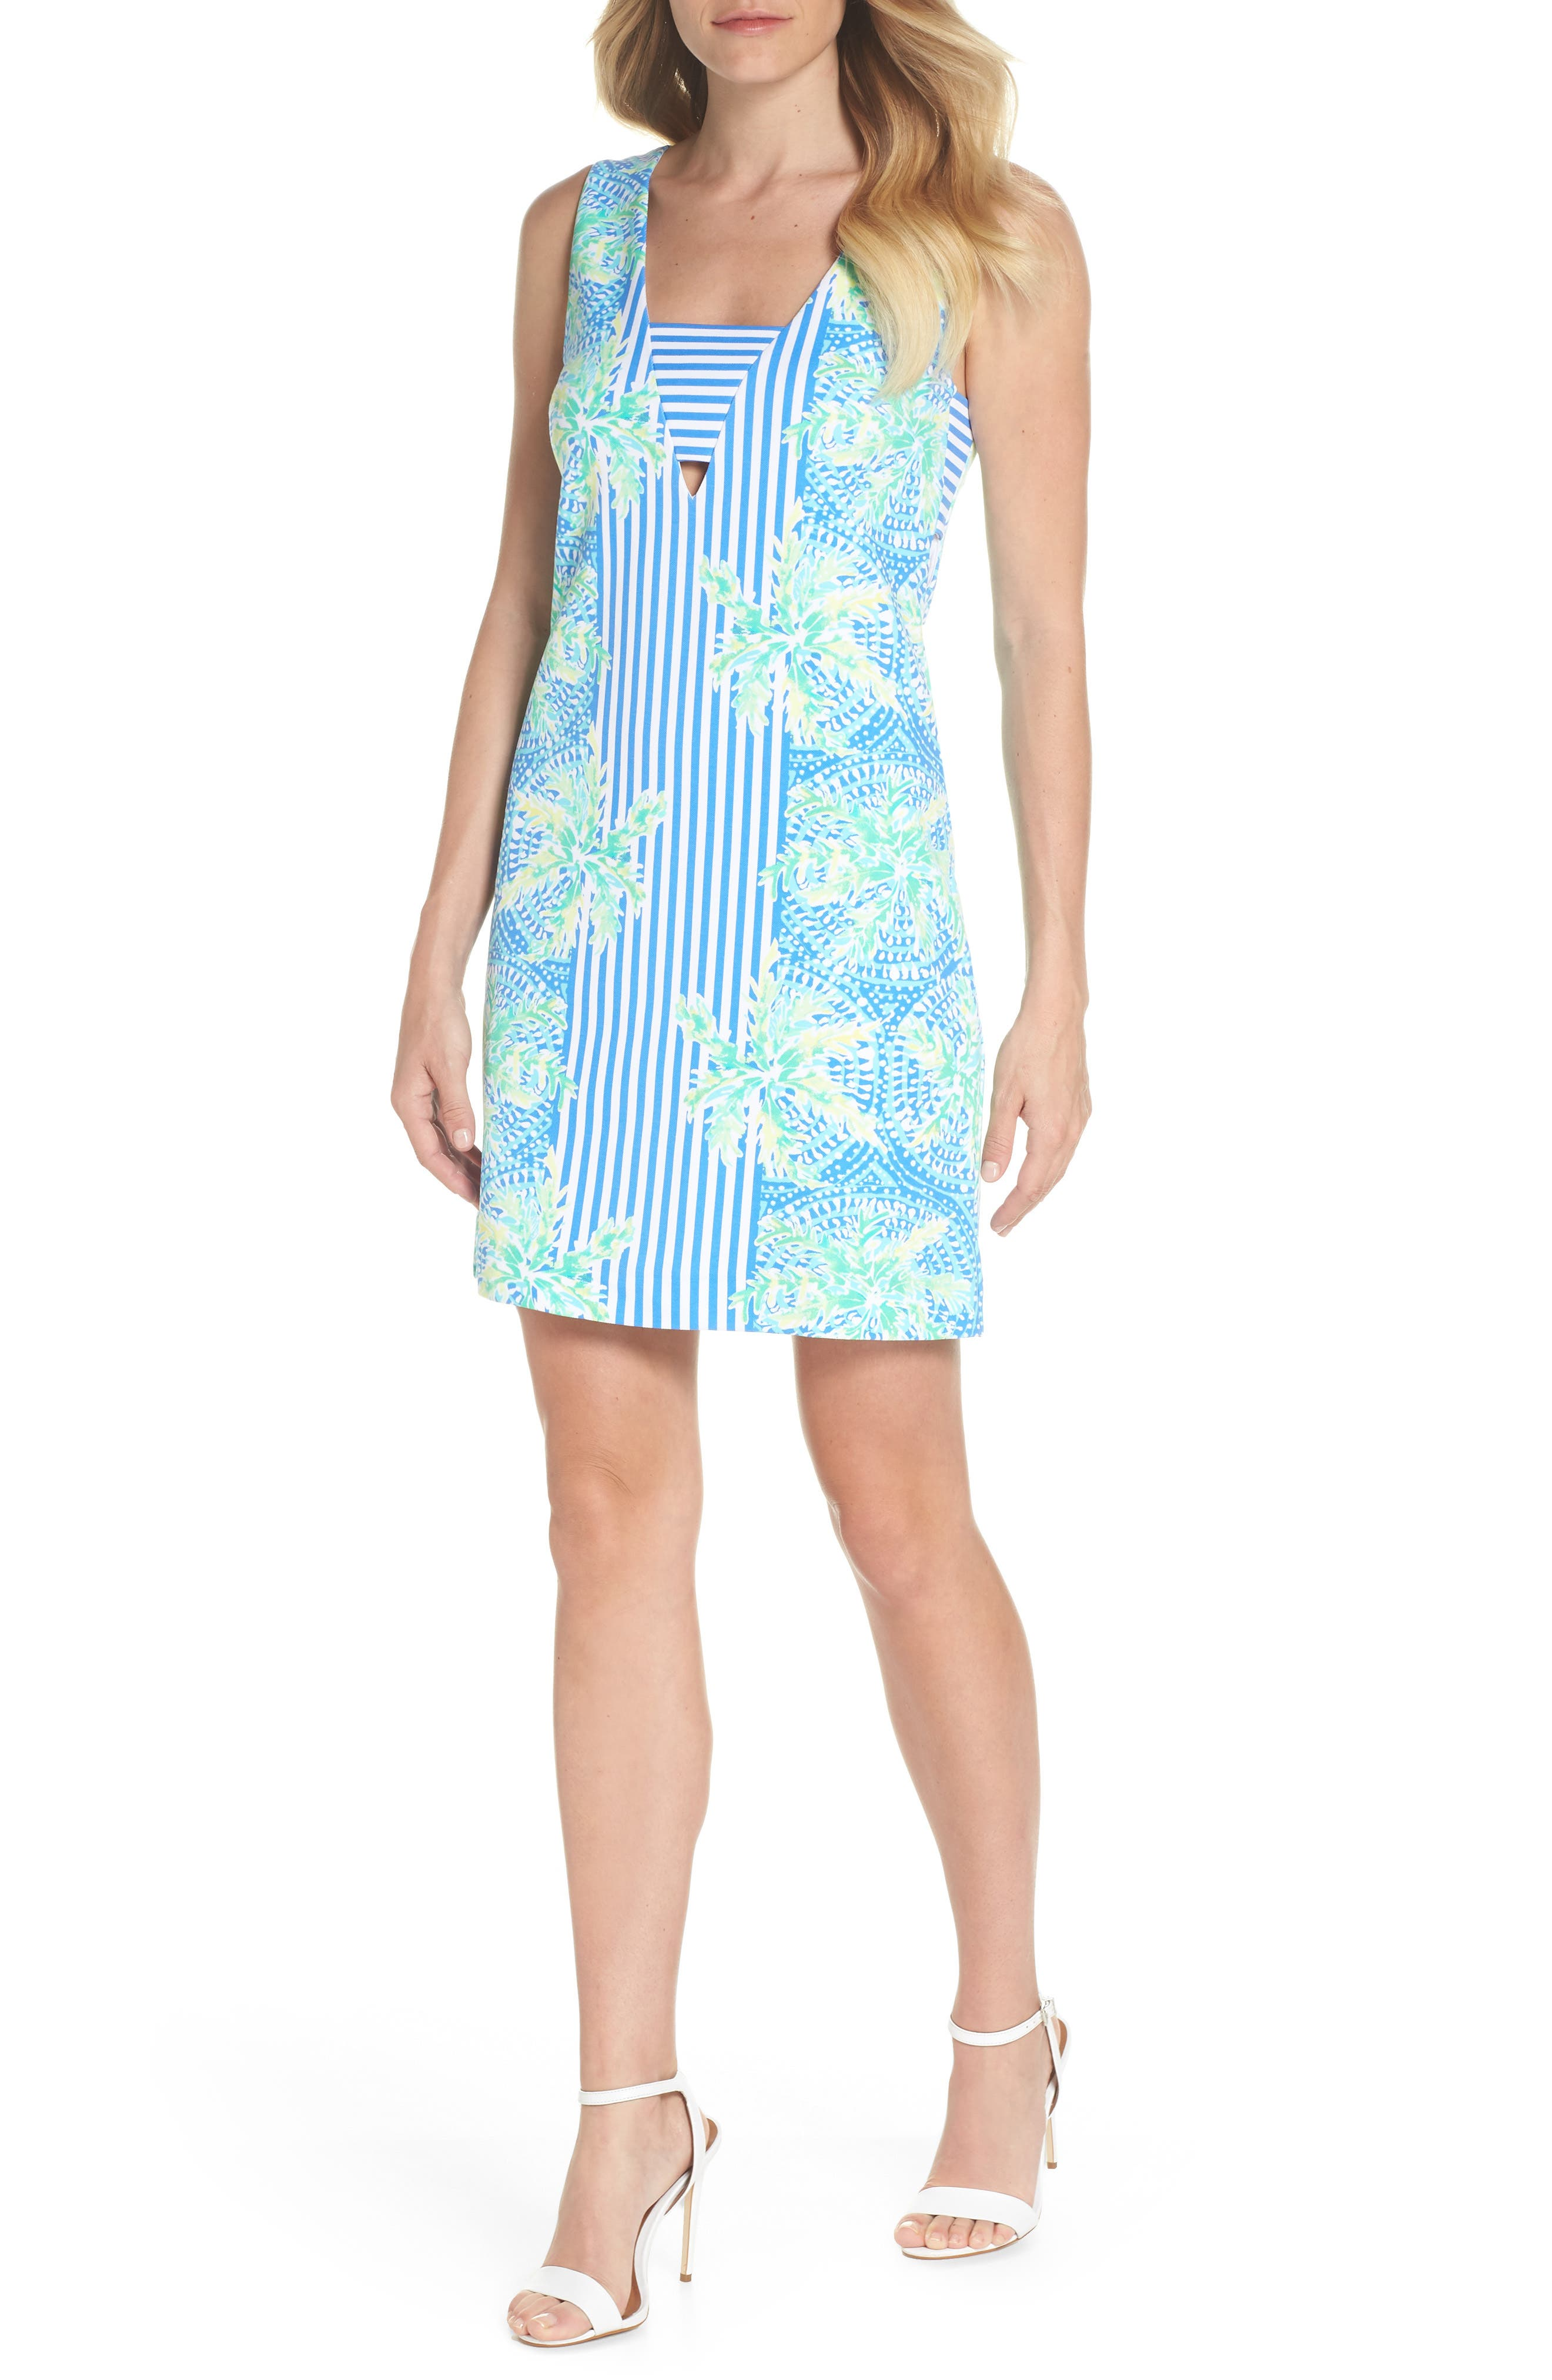 Chiara Stripe & Floral Print Dress,                             Alternate thumbnail 5, color,                             BENNET BLUE TROPIC LIKE ITS